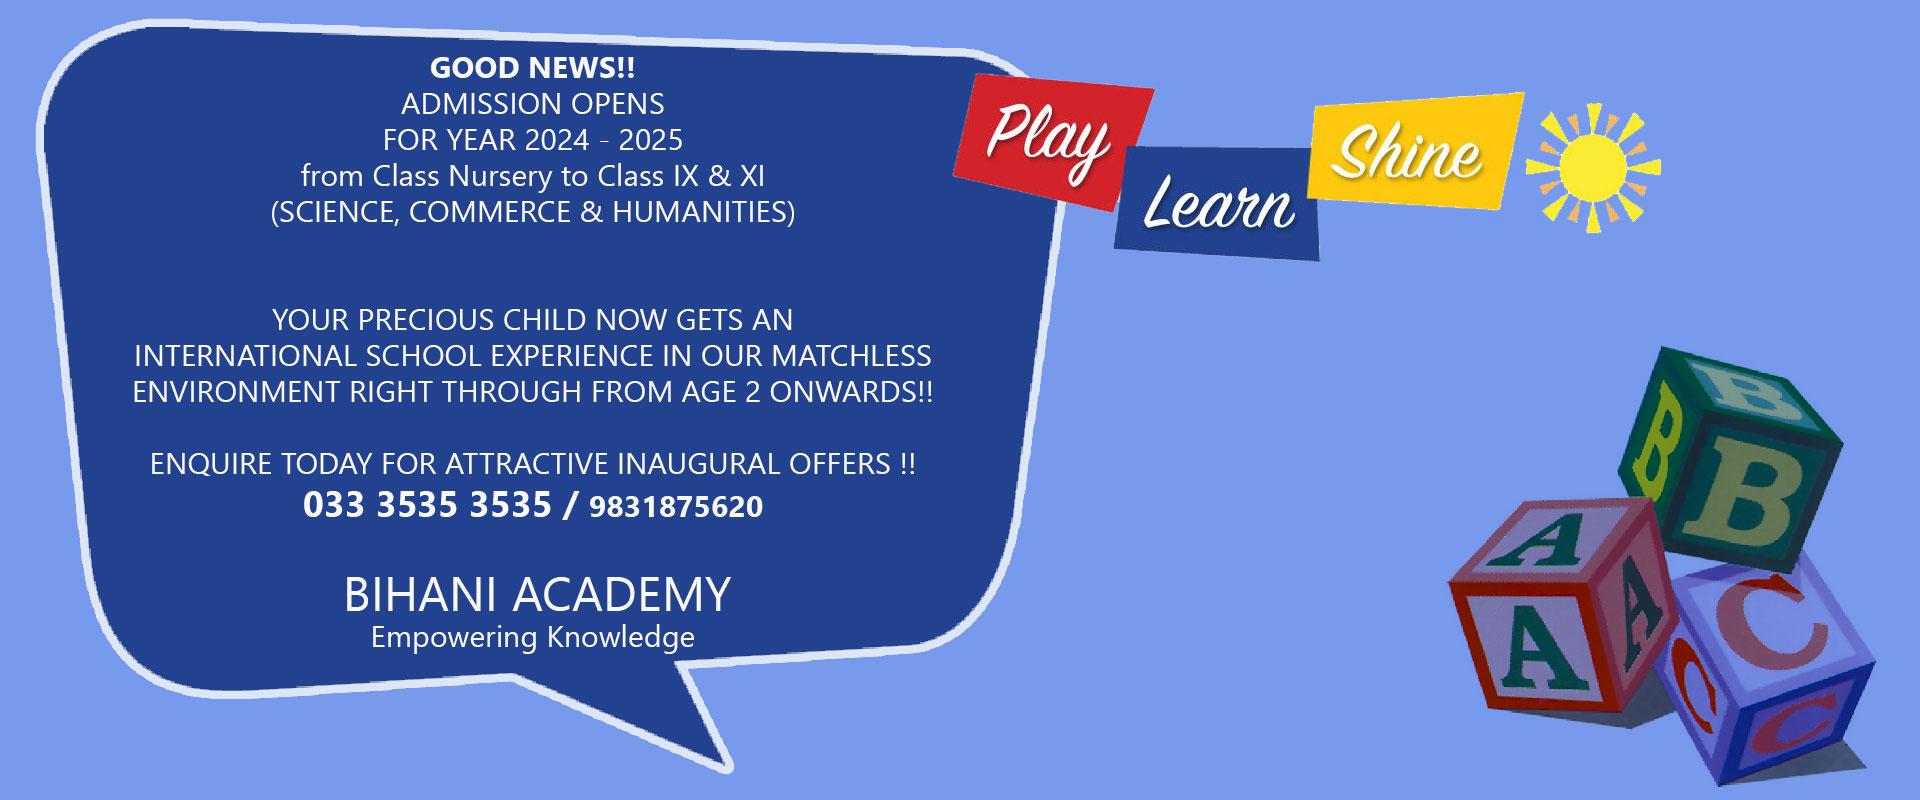 Cbse School In Kolkata For Boys Girls Mount Litera Dhr